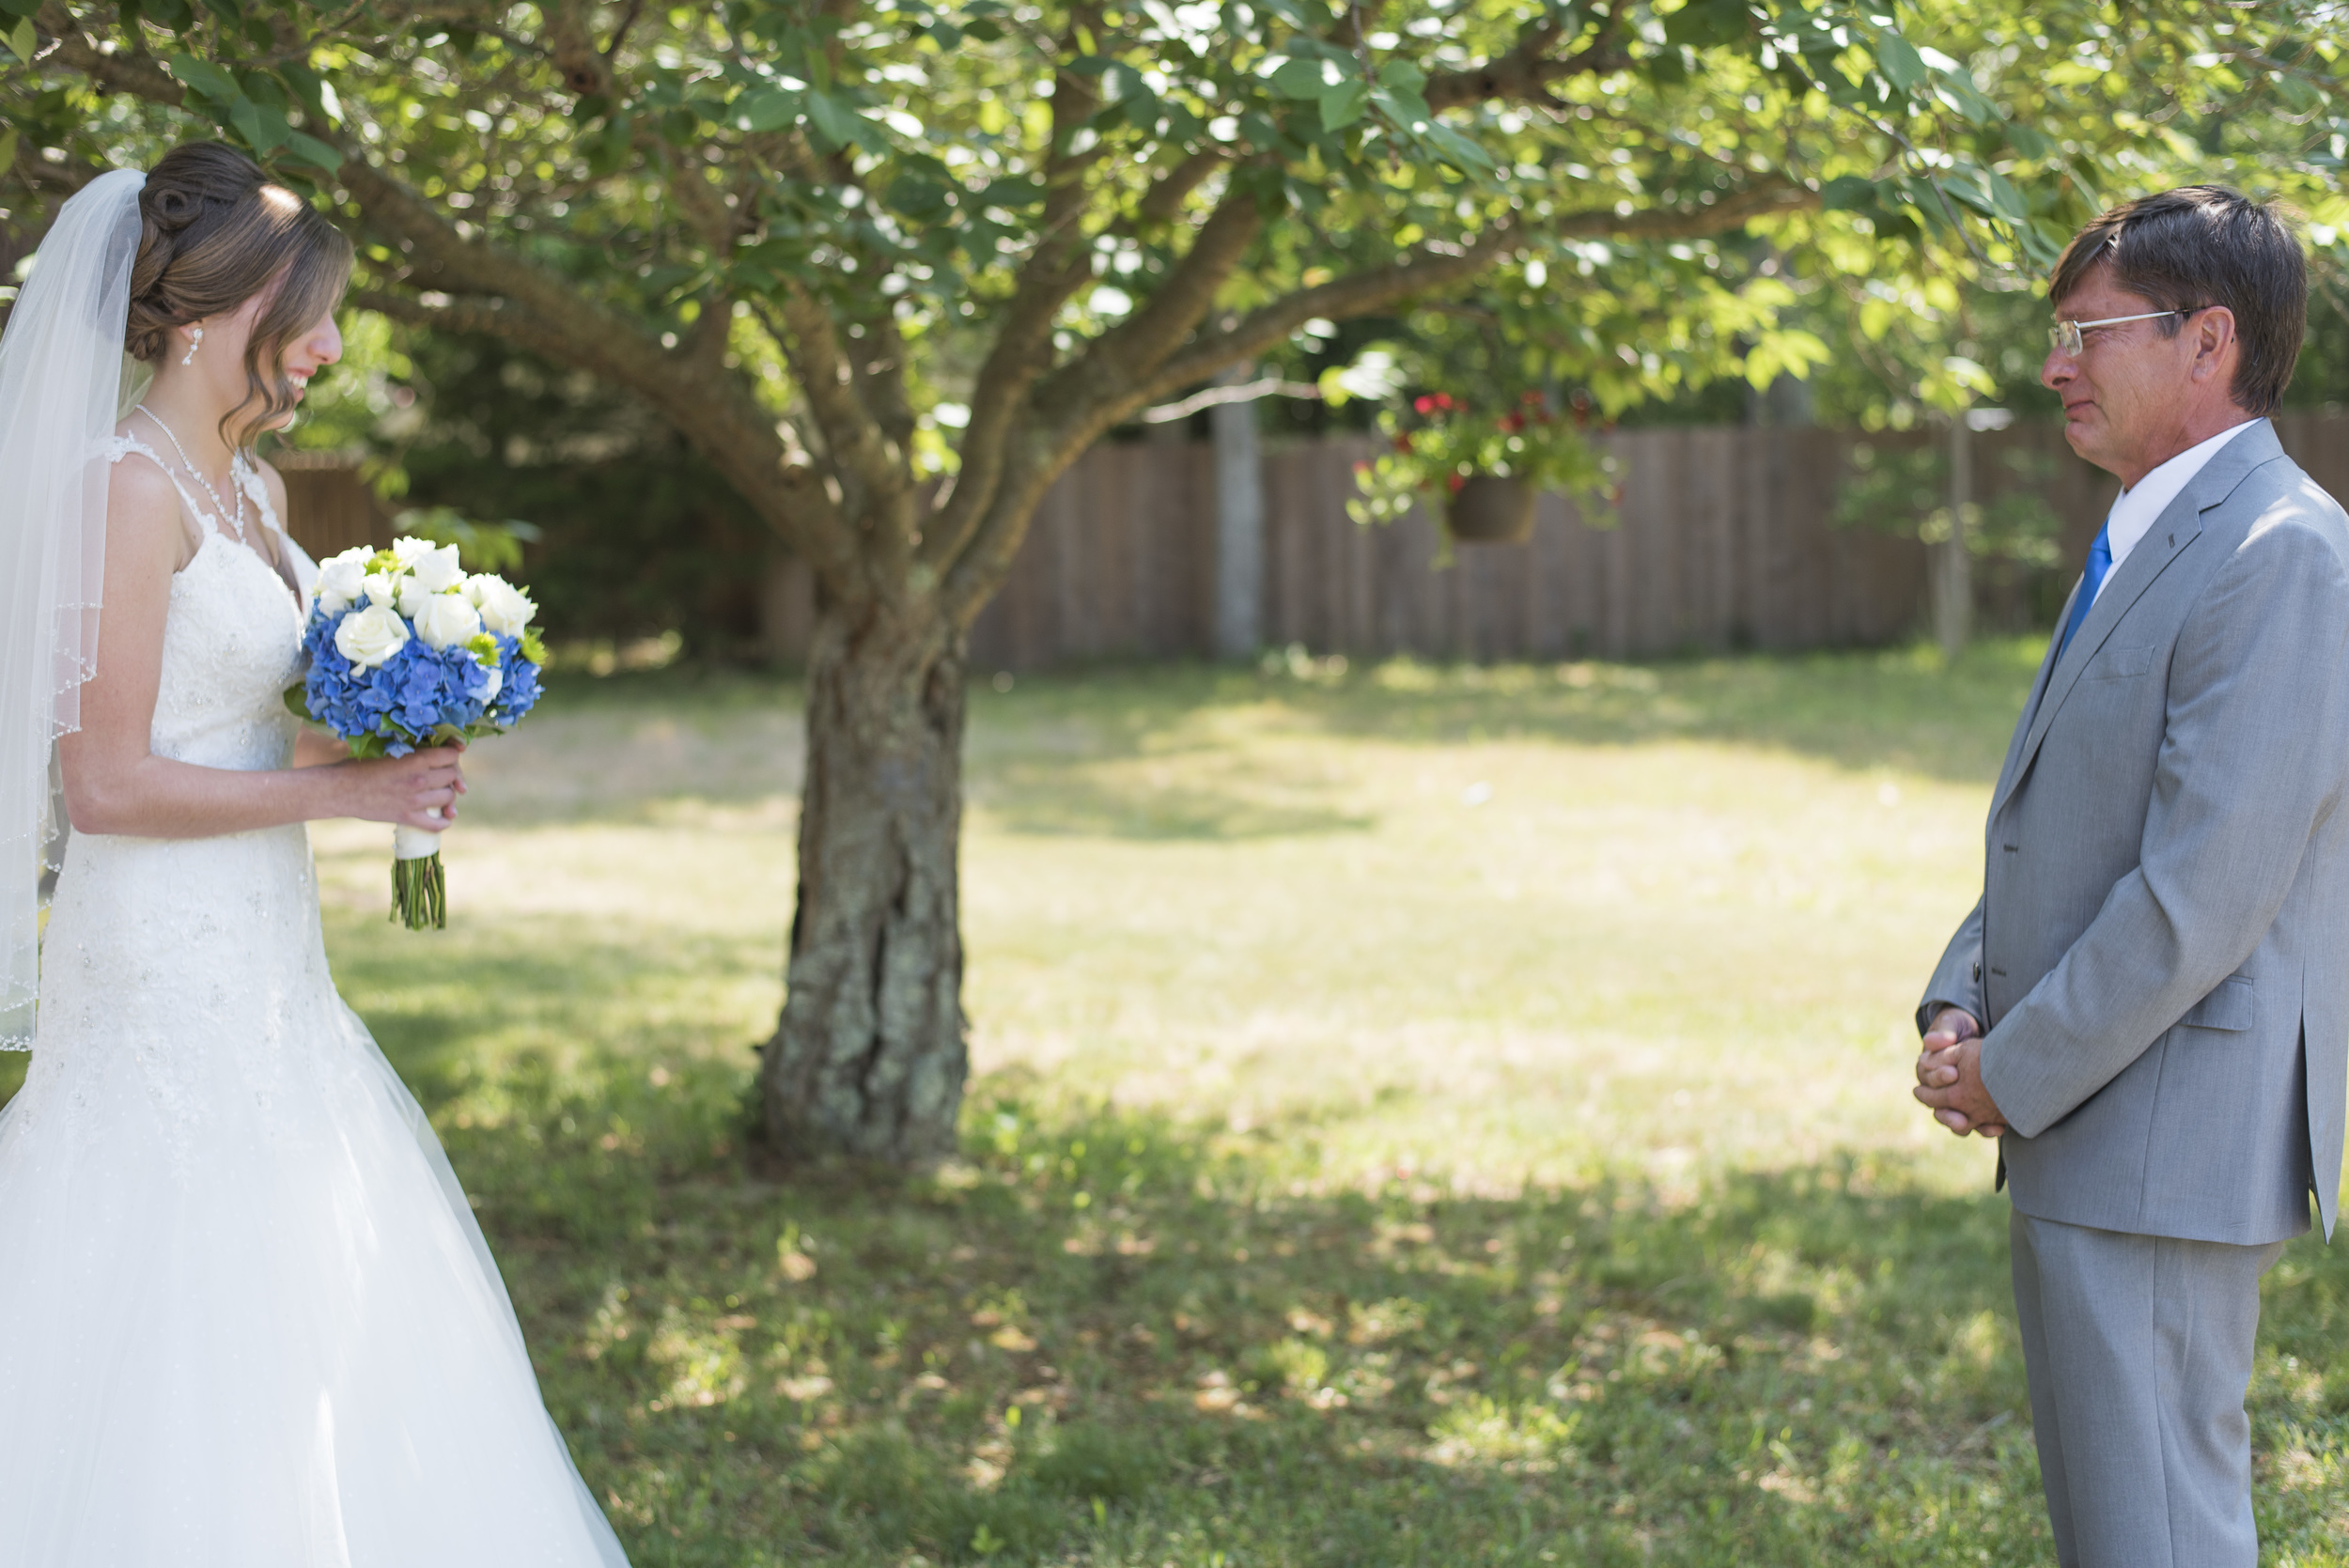 New_jersey_blue_heron_pines_wedding20150529_0526.jpg